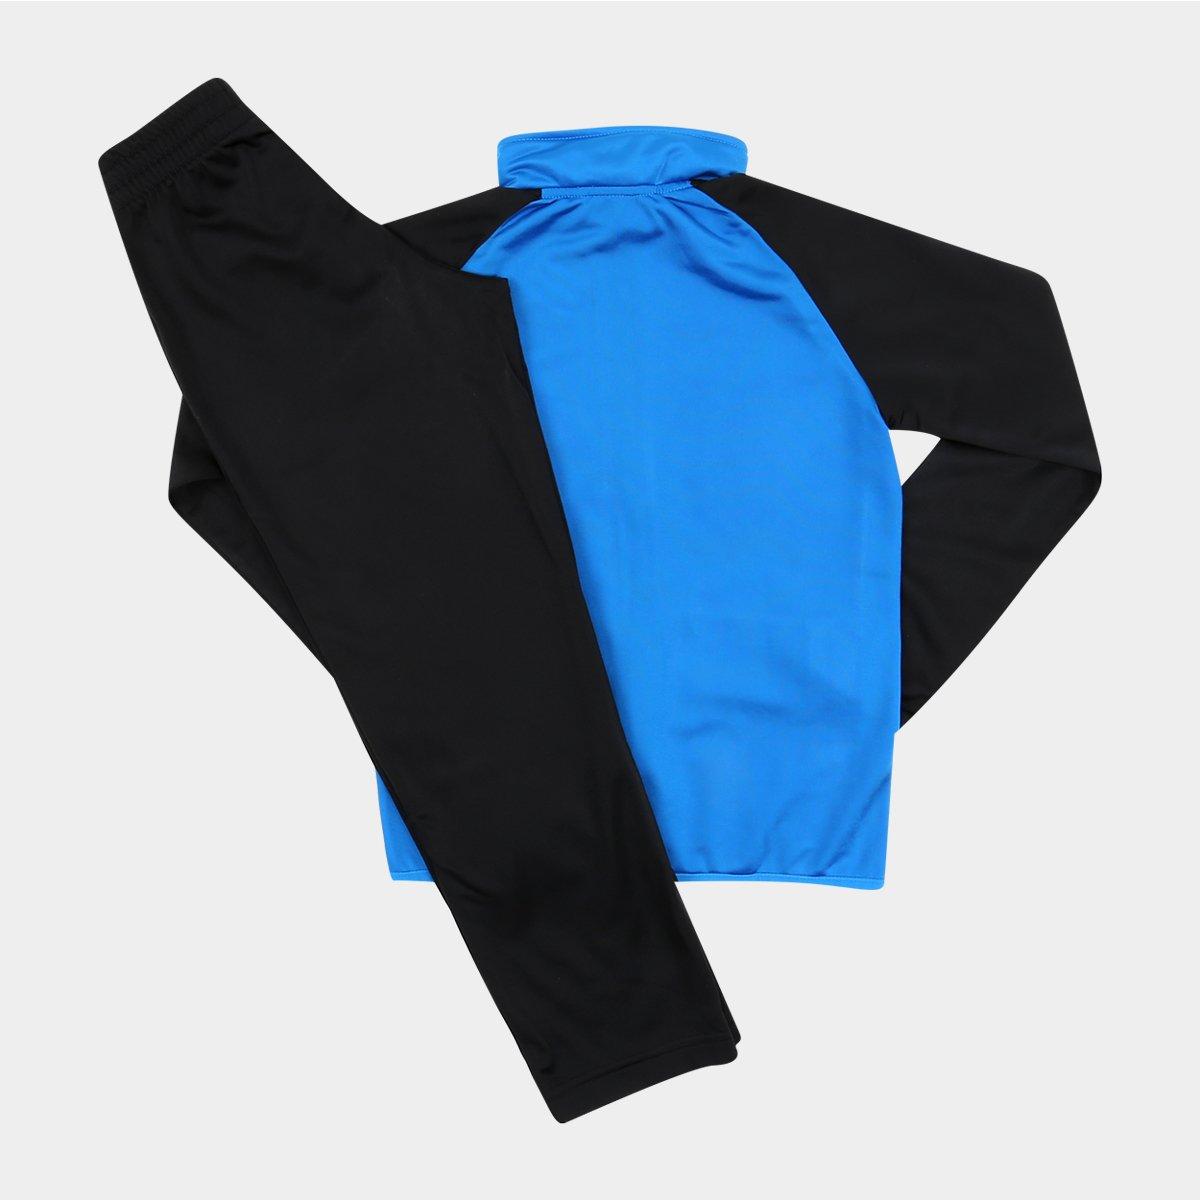 Agasalho Adidas Yb Ts Entry Oh Infantil - Compre Agora  fd3646f38c220